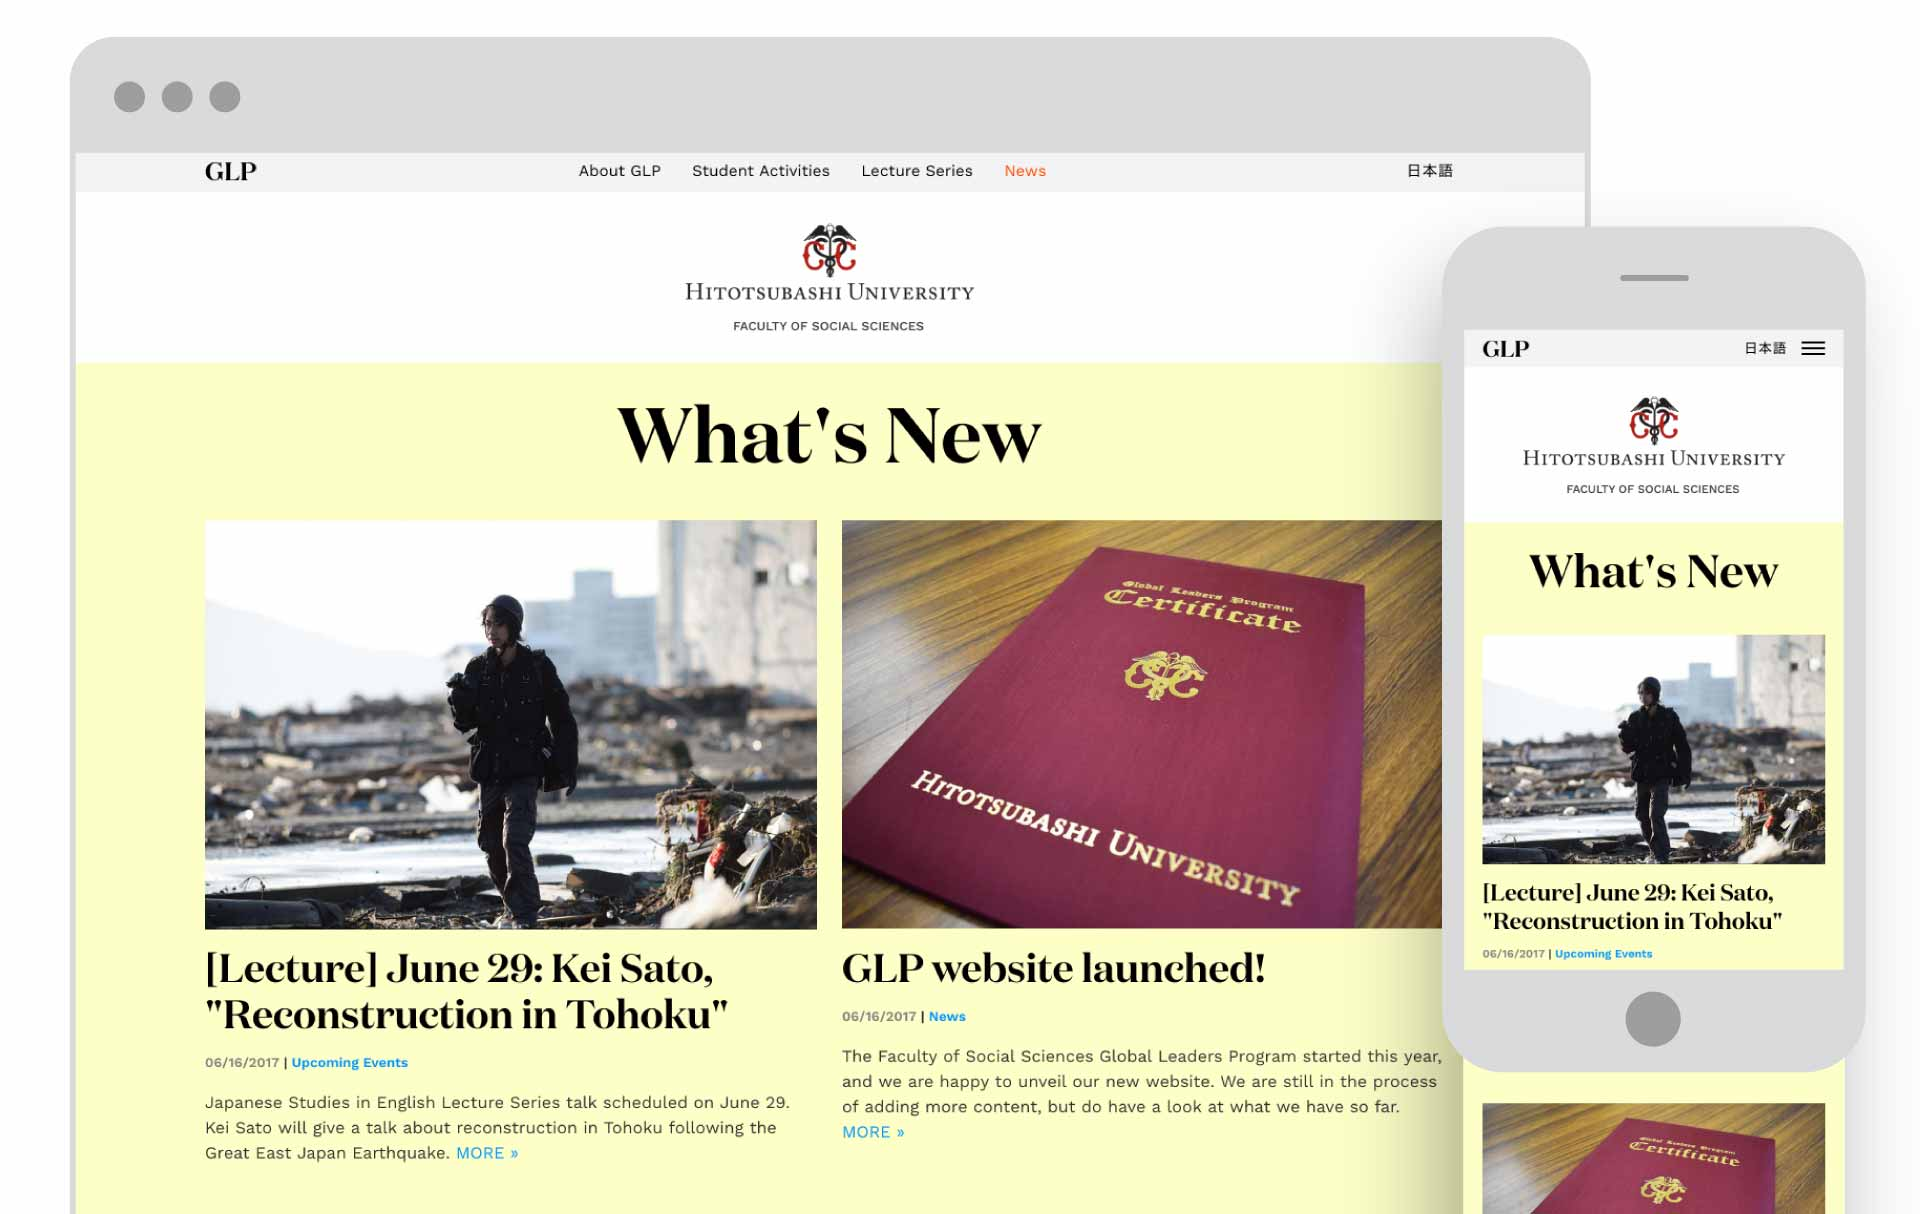 Hitotsubashi University - Global Leaders Program - News Listing Page Template